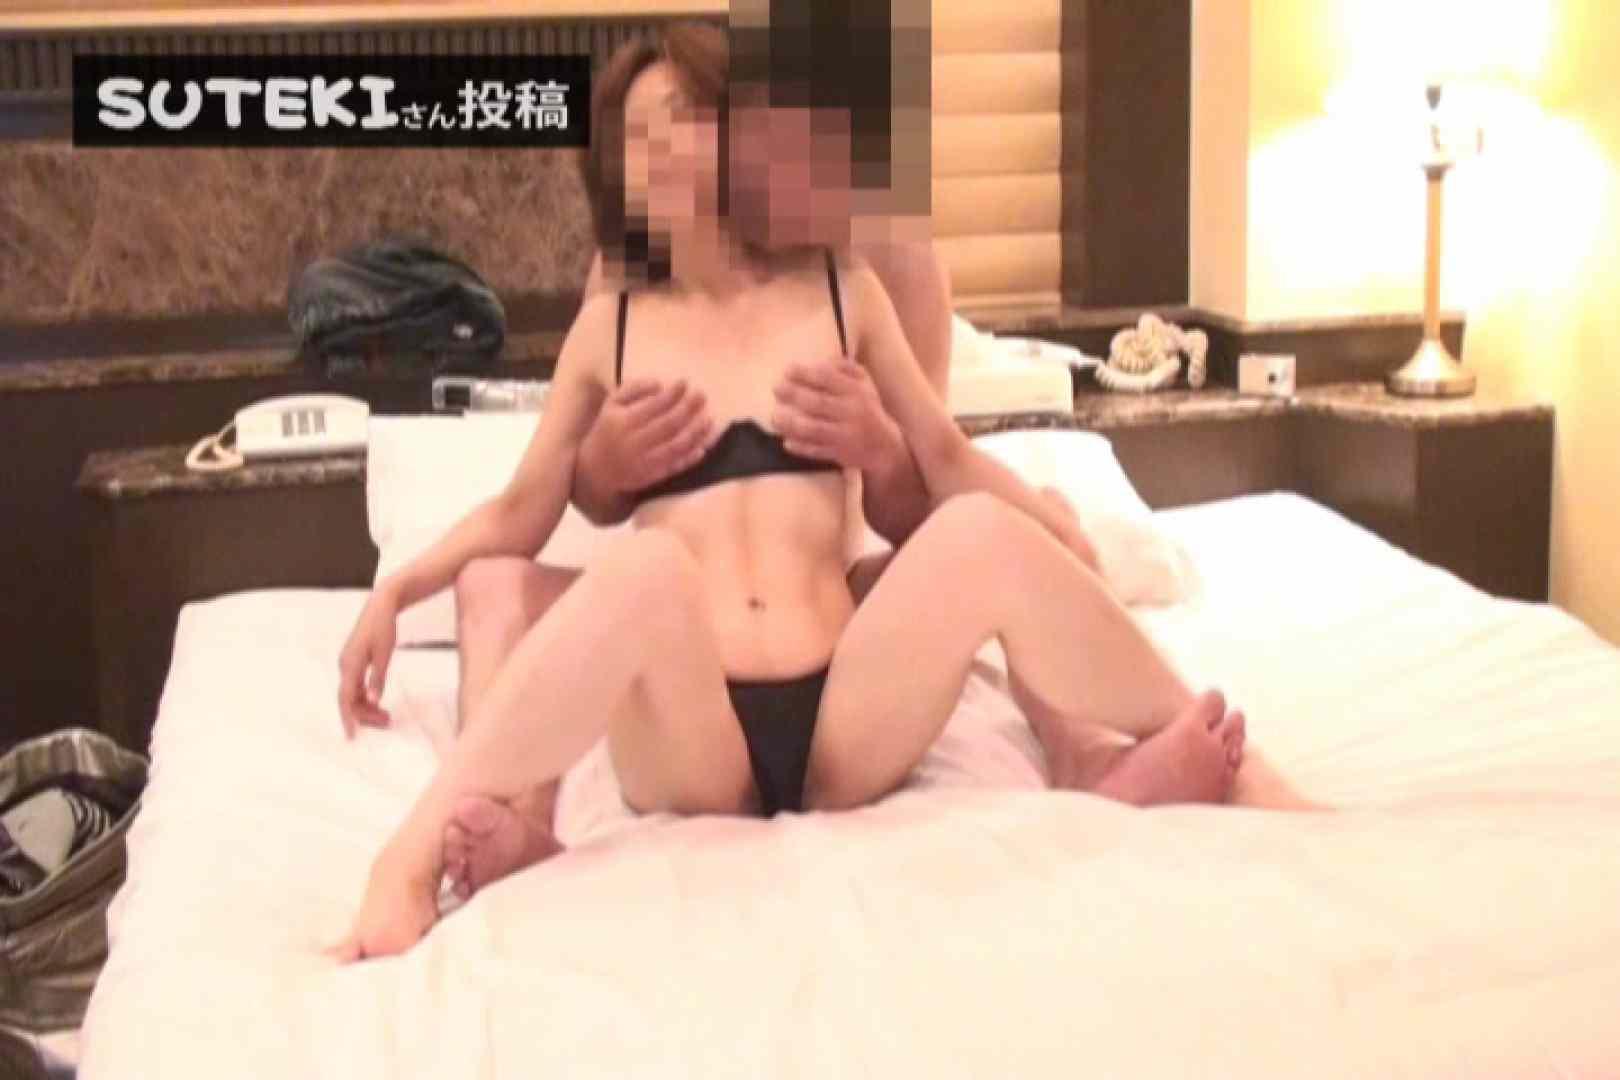 SUTEKIさん投稿 エナメルオープンブラ OLの裸事情 盗撮画像 95枚 17